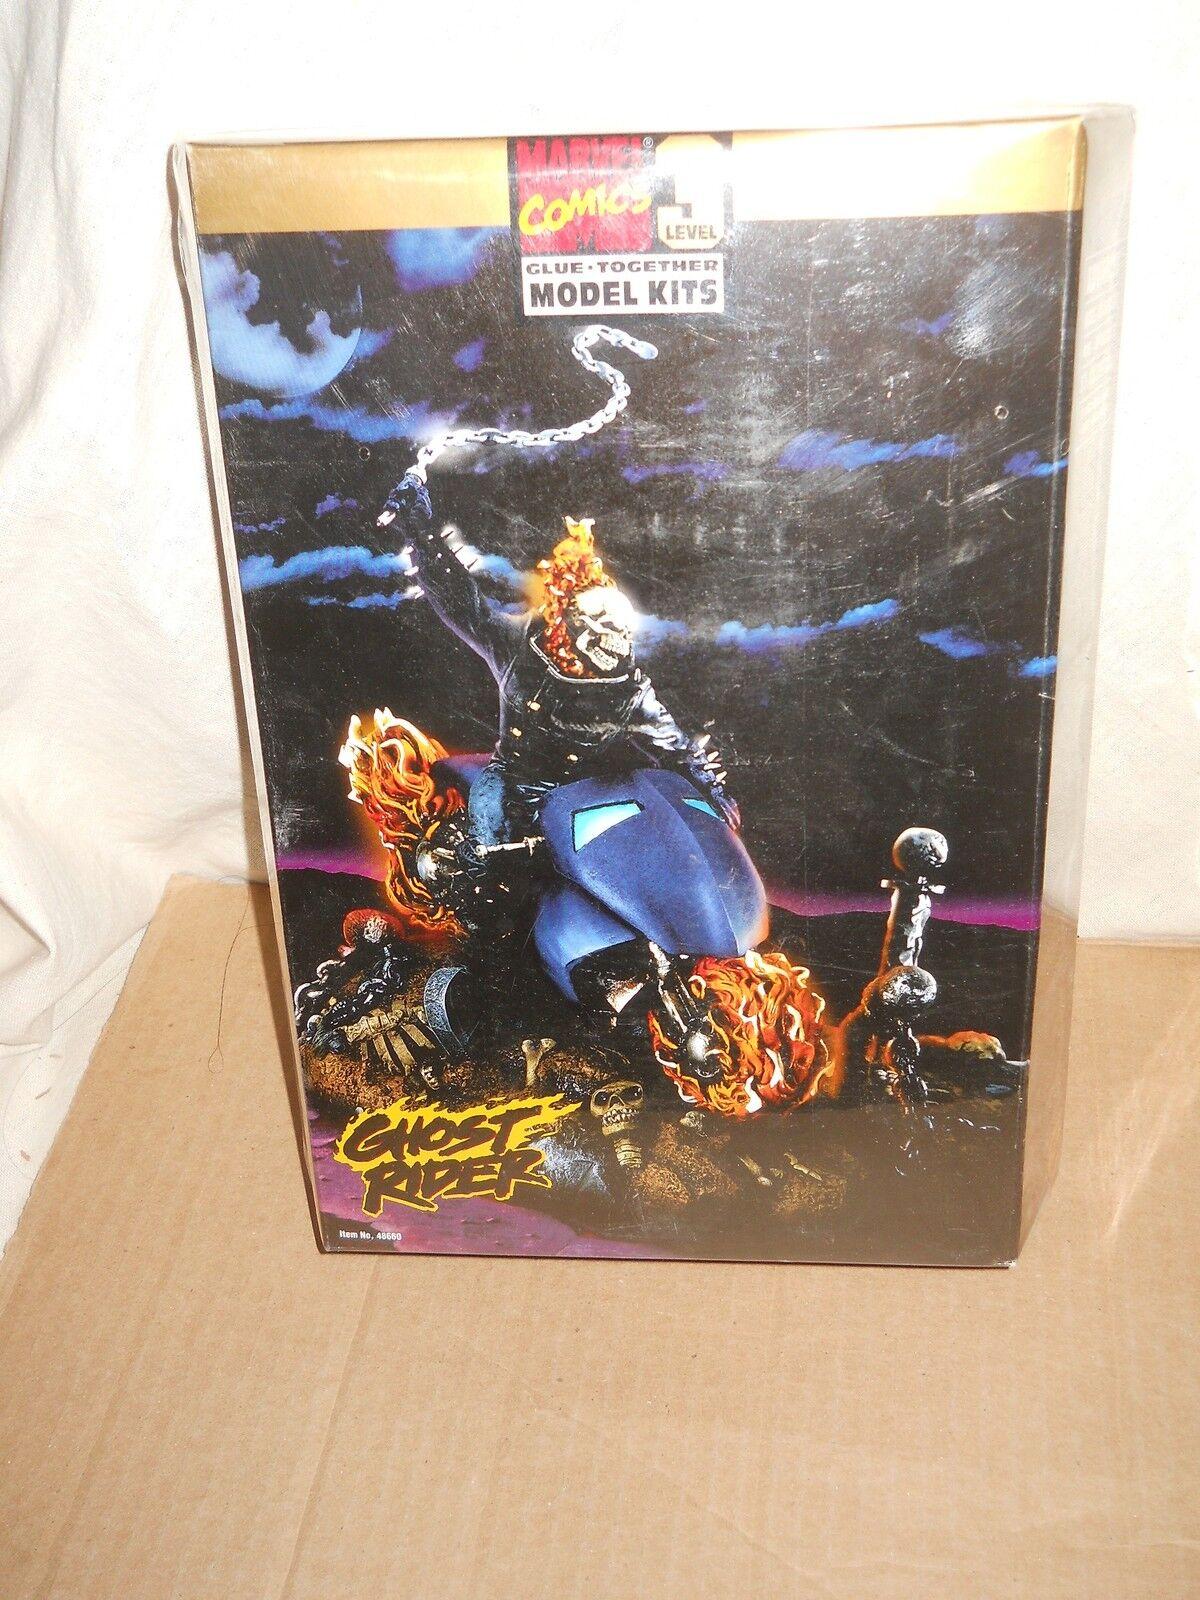 ToyBiz  Marvel Comics 3 level Glue-Together Model Kits  Ghost Rider (48660)